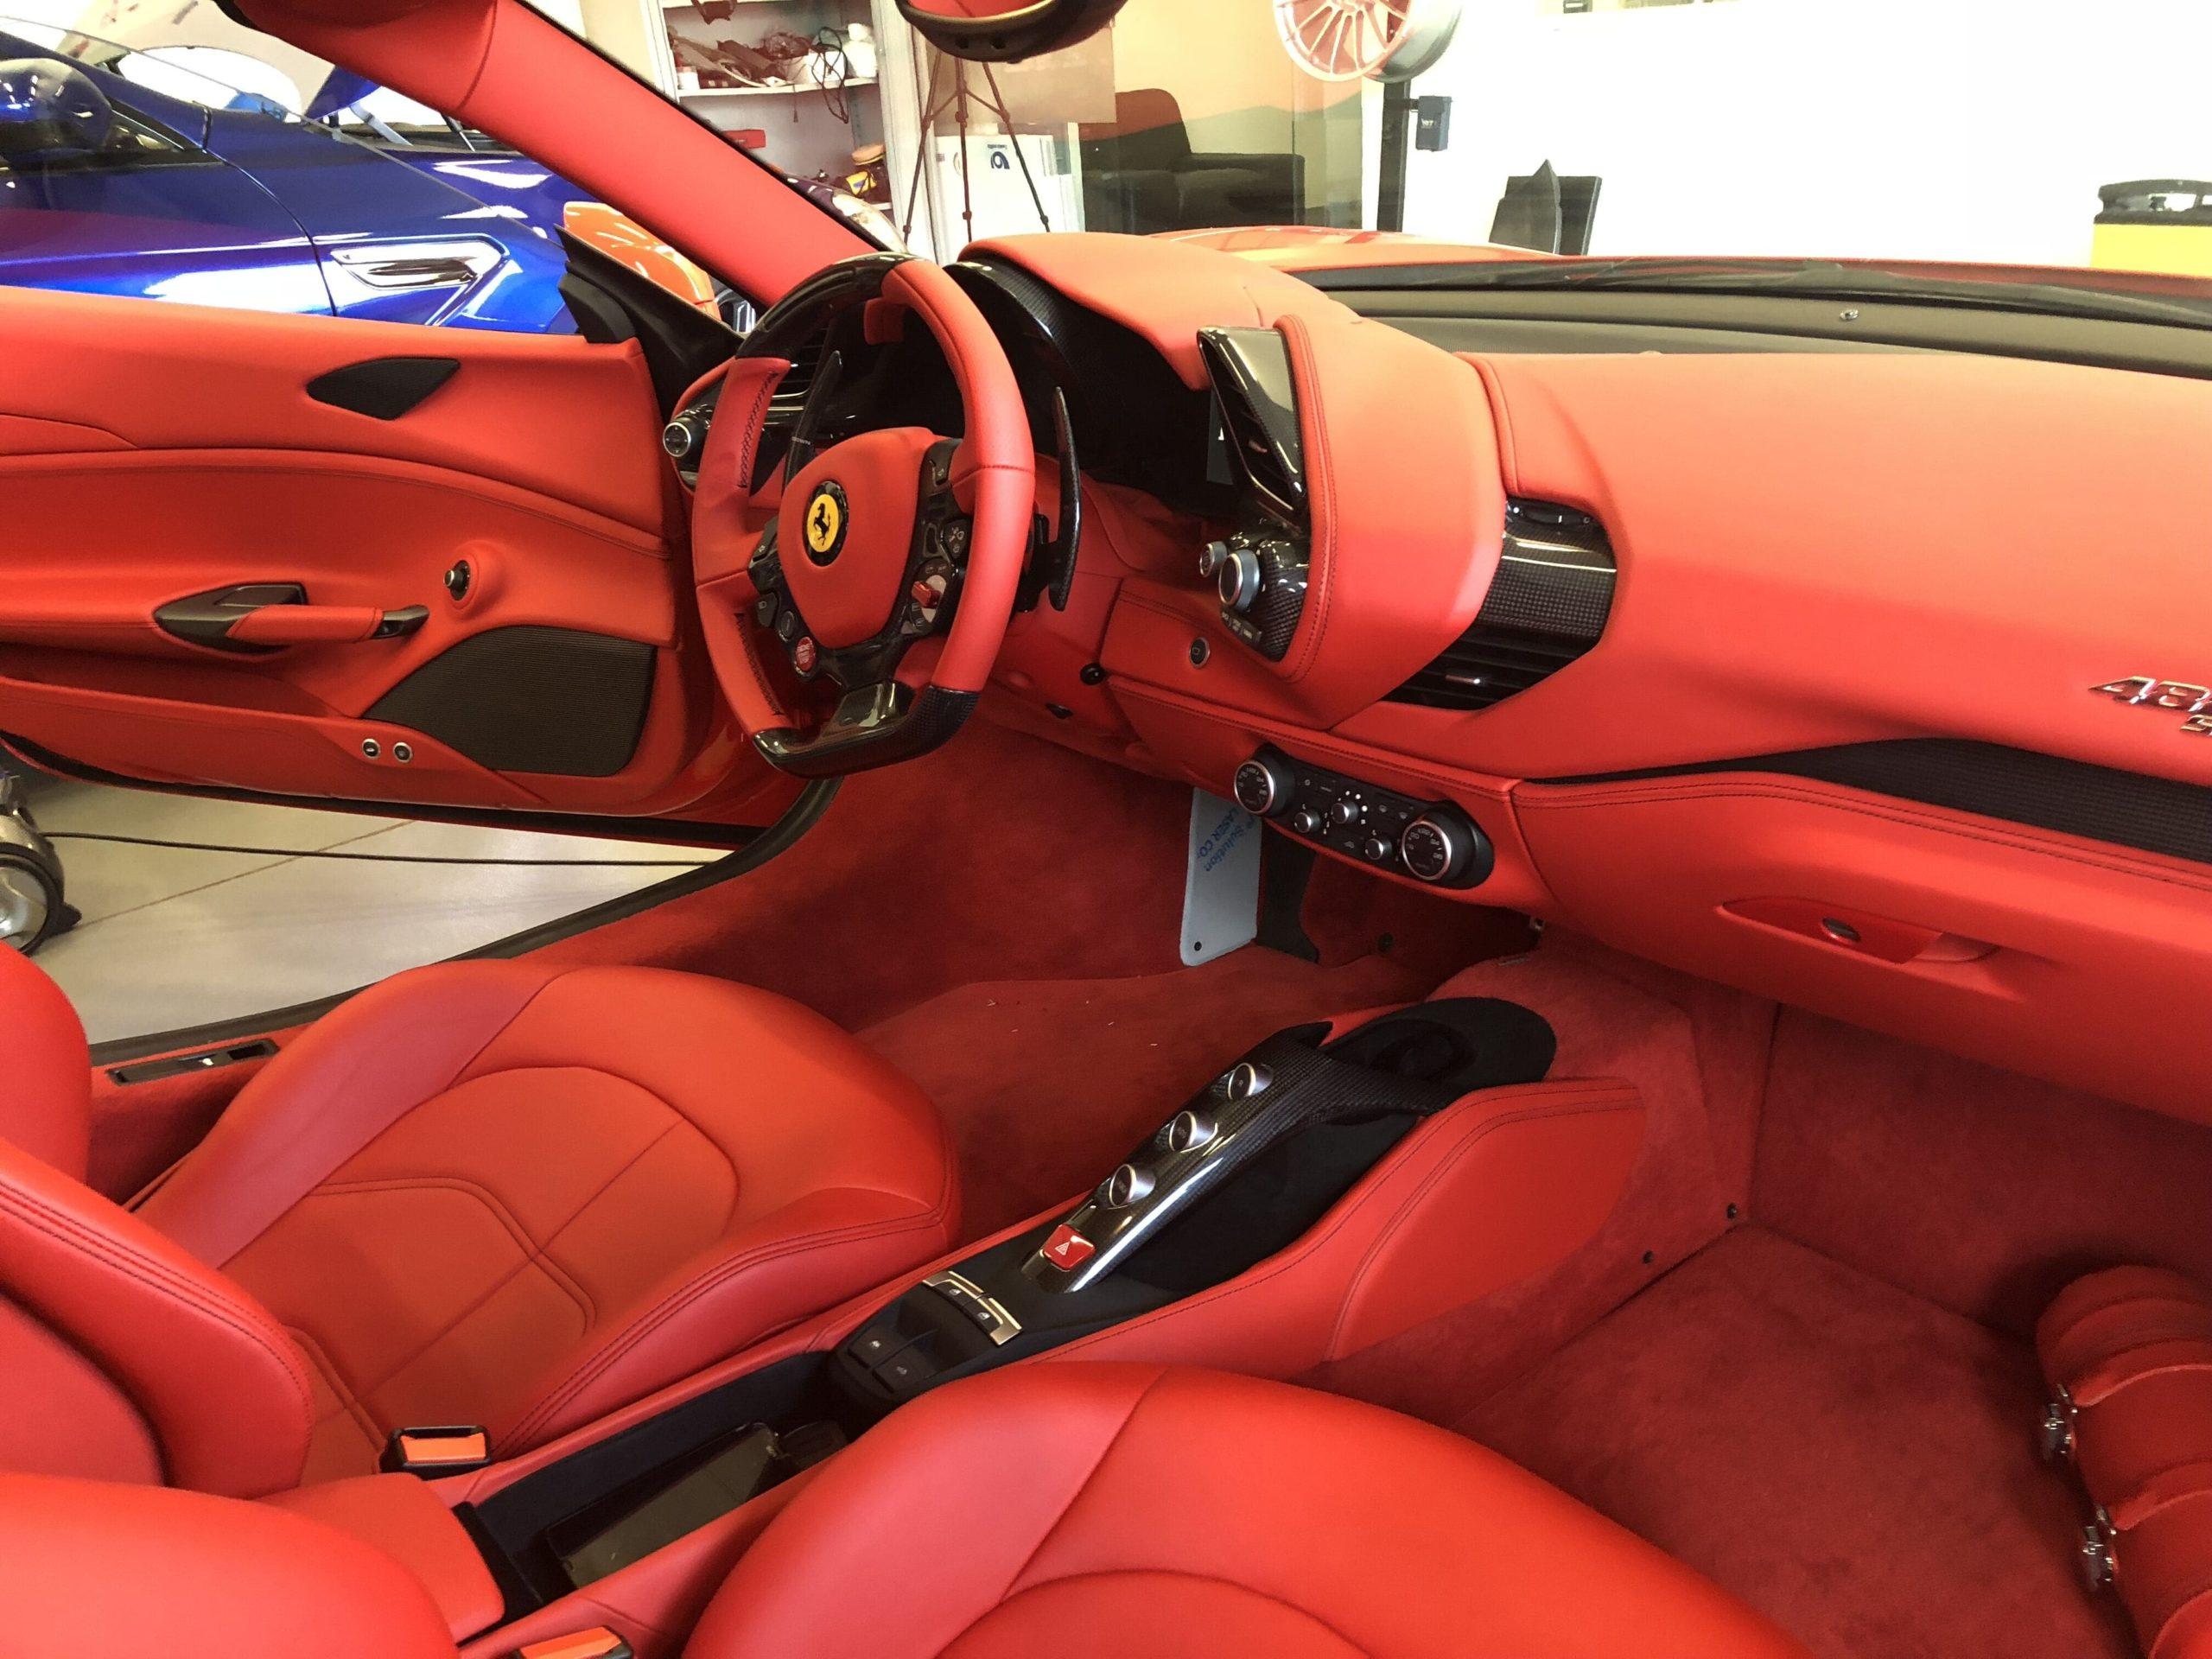 Interiér supersportu Ferrari - prodej pevného antiradaru Protector 960